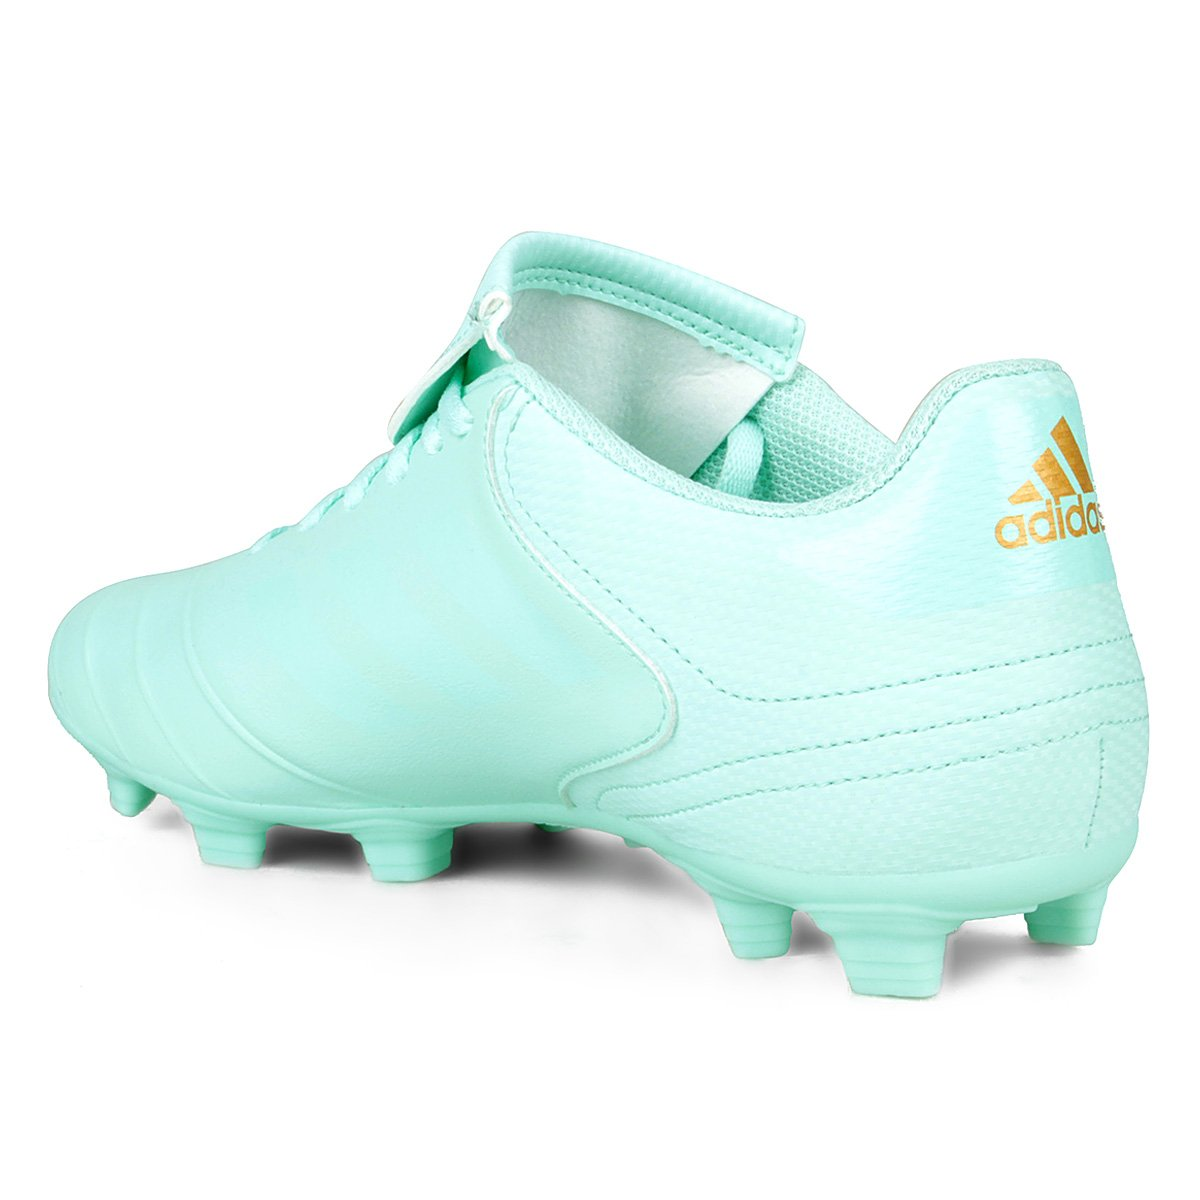 2a50fa949e8f86  Chuteira Campo Adidas Copa 18 4 FG Masculina - Verde água -  Compre . e7be7f9d0bee2